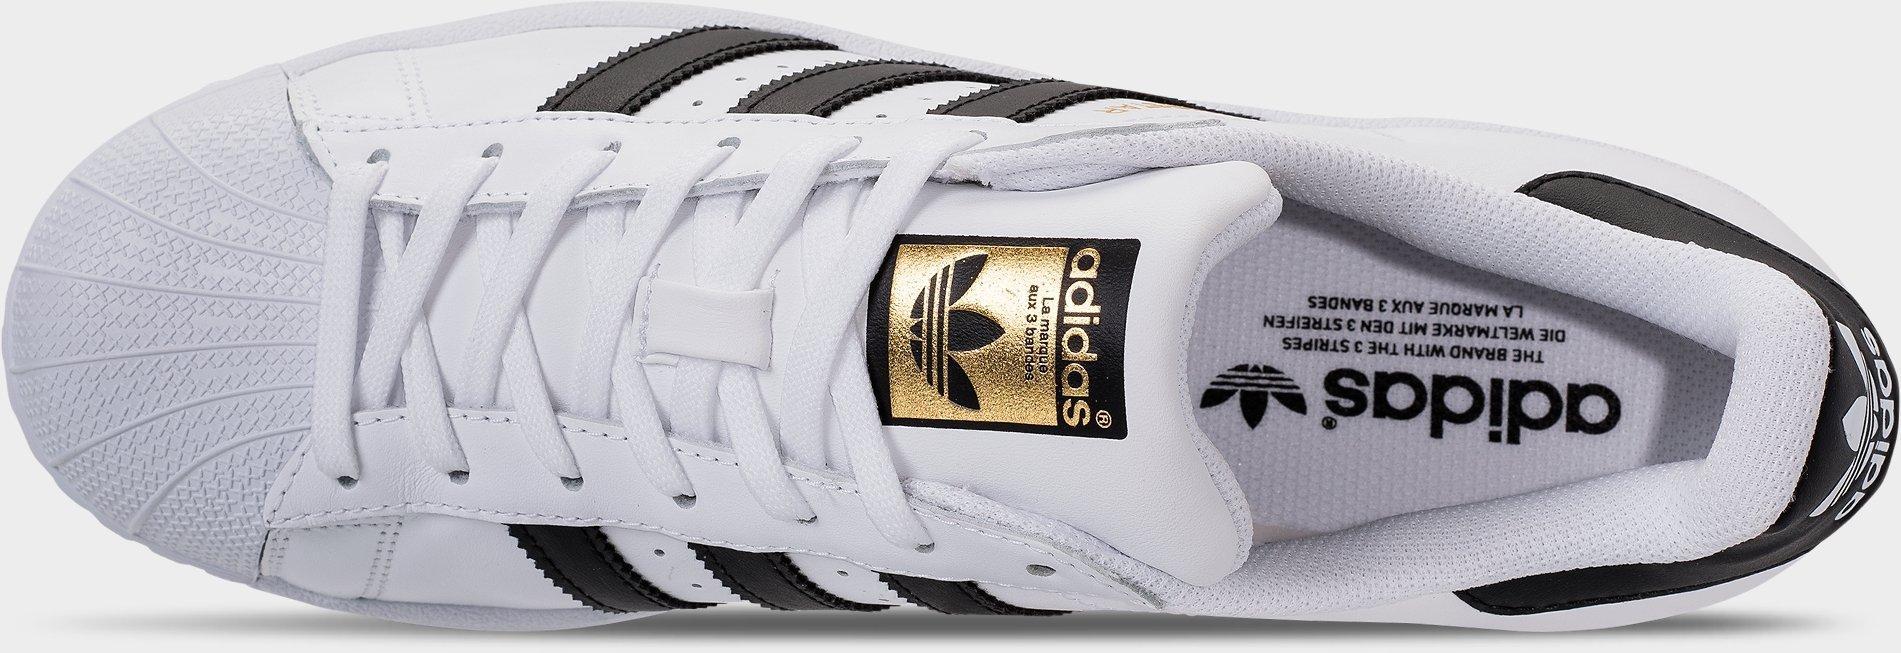 adidas superstar low tops